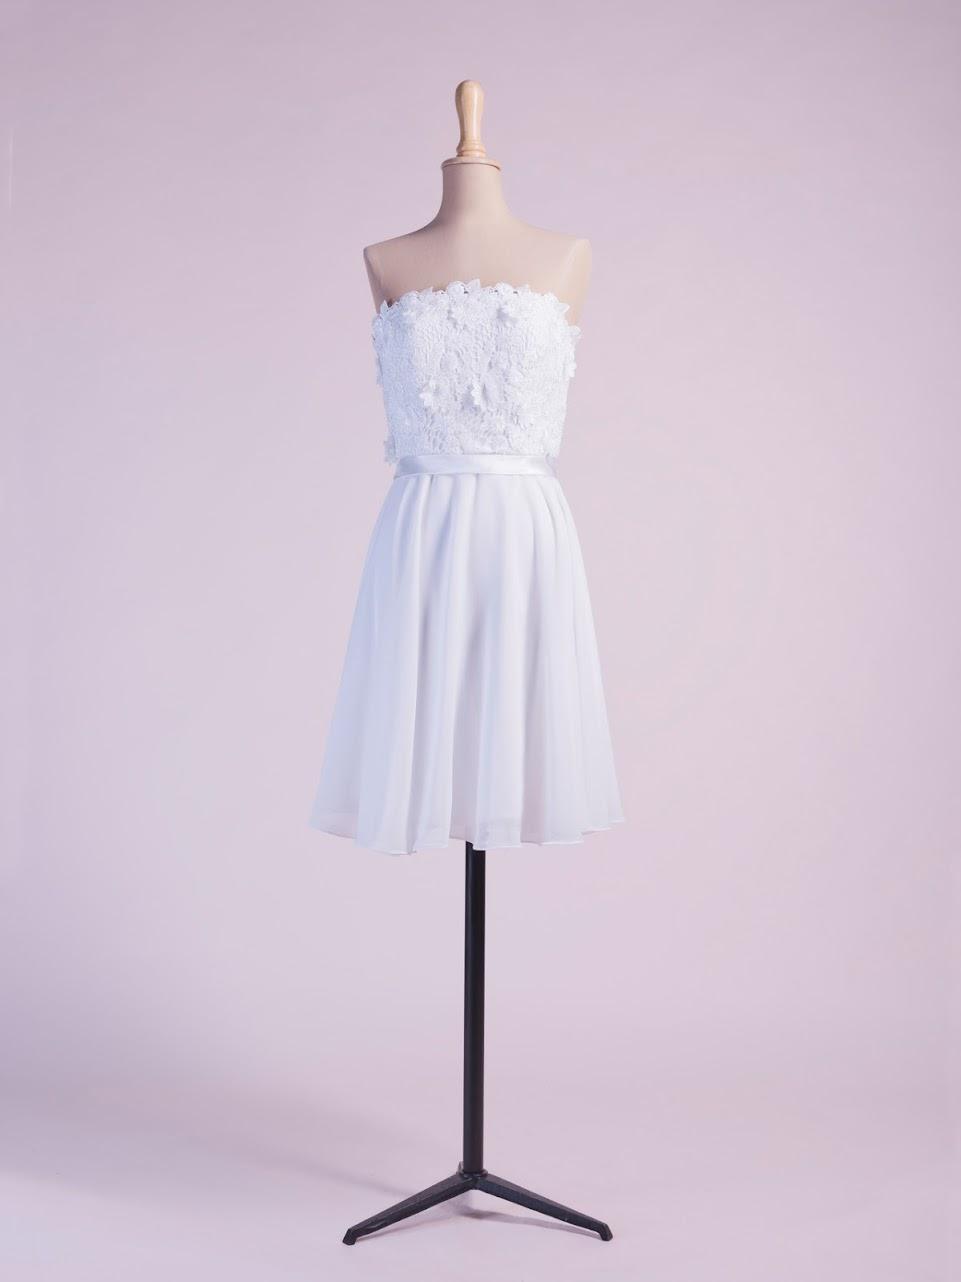 robe-de-mariage-civil-clothilde-robe-de-mariee-courte-robe-du-lendemain-du-mariage-en-dentelle